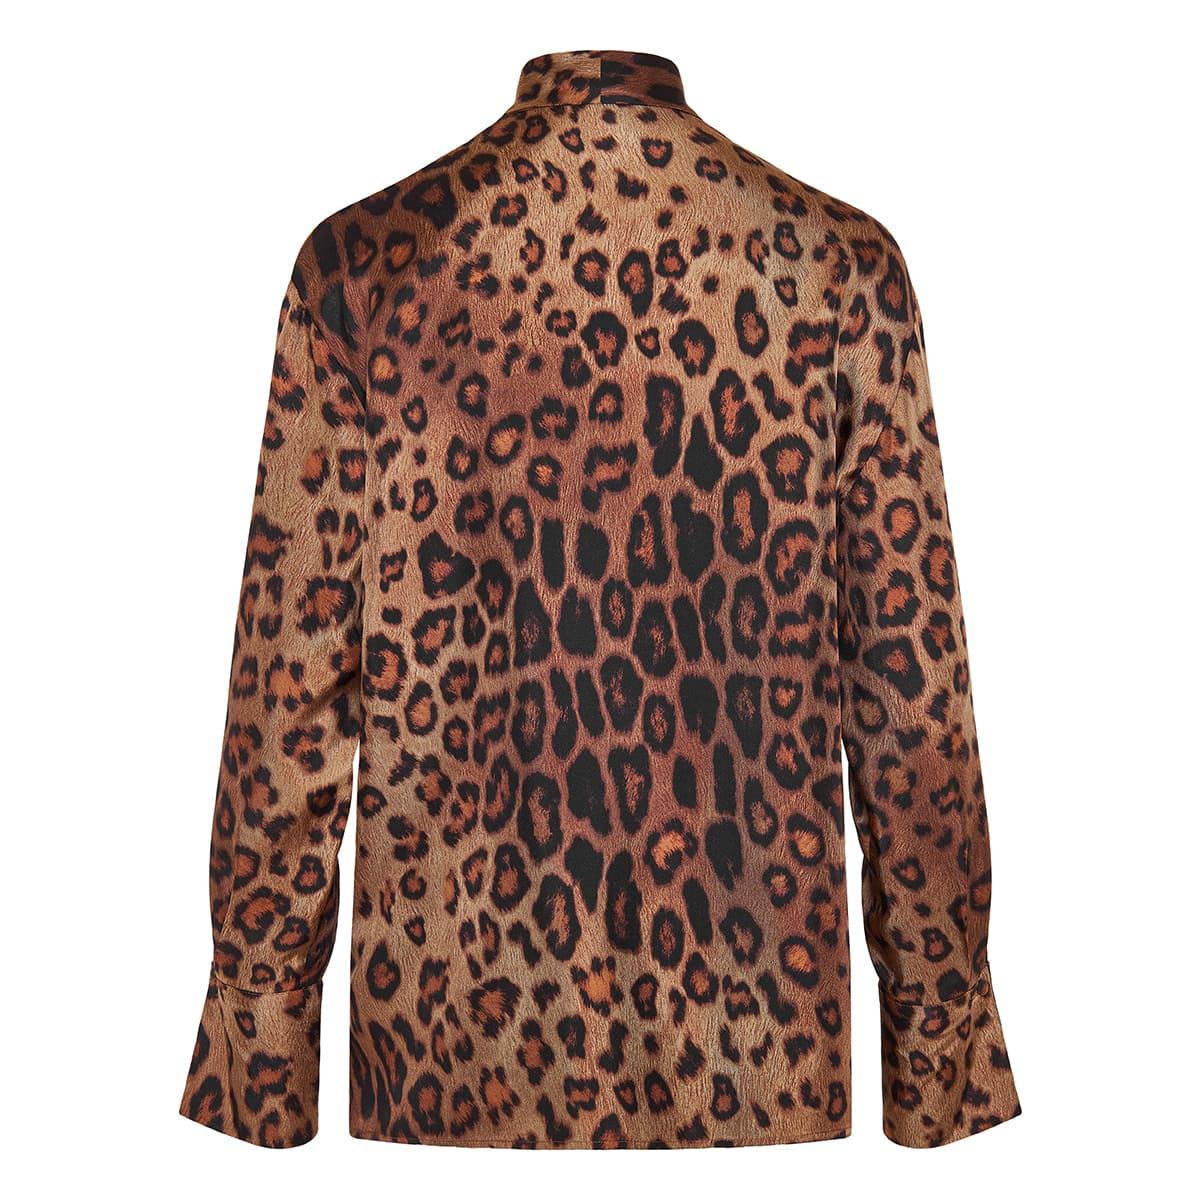 Bow-tie leopard silk shirt